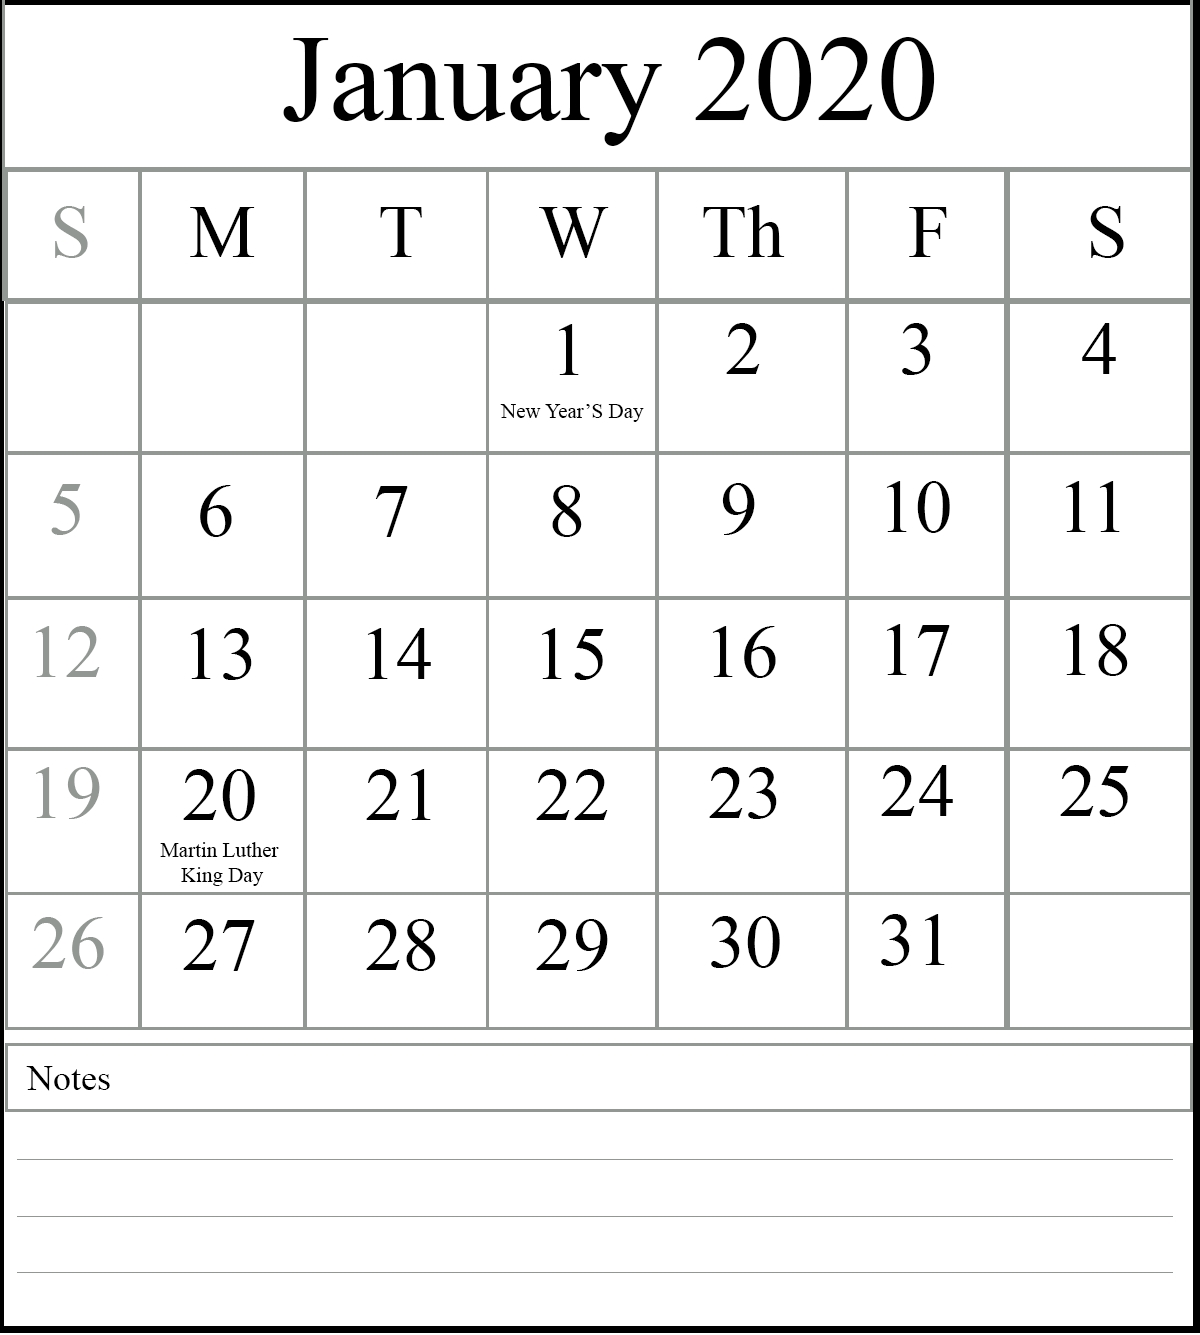 Free Blank January 2020 Calendar Printable In Pdf, Word-January 2020 Calendar Holidays